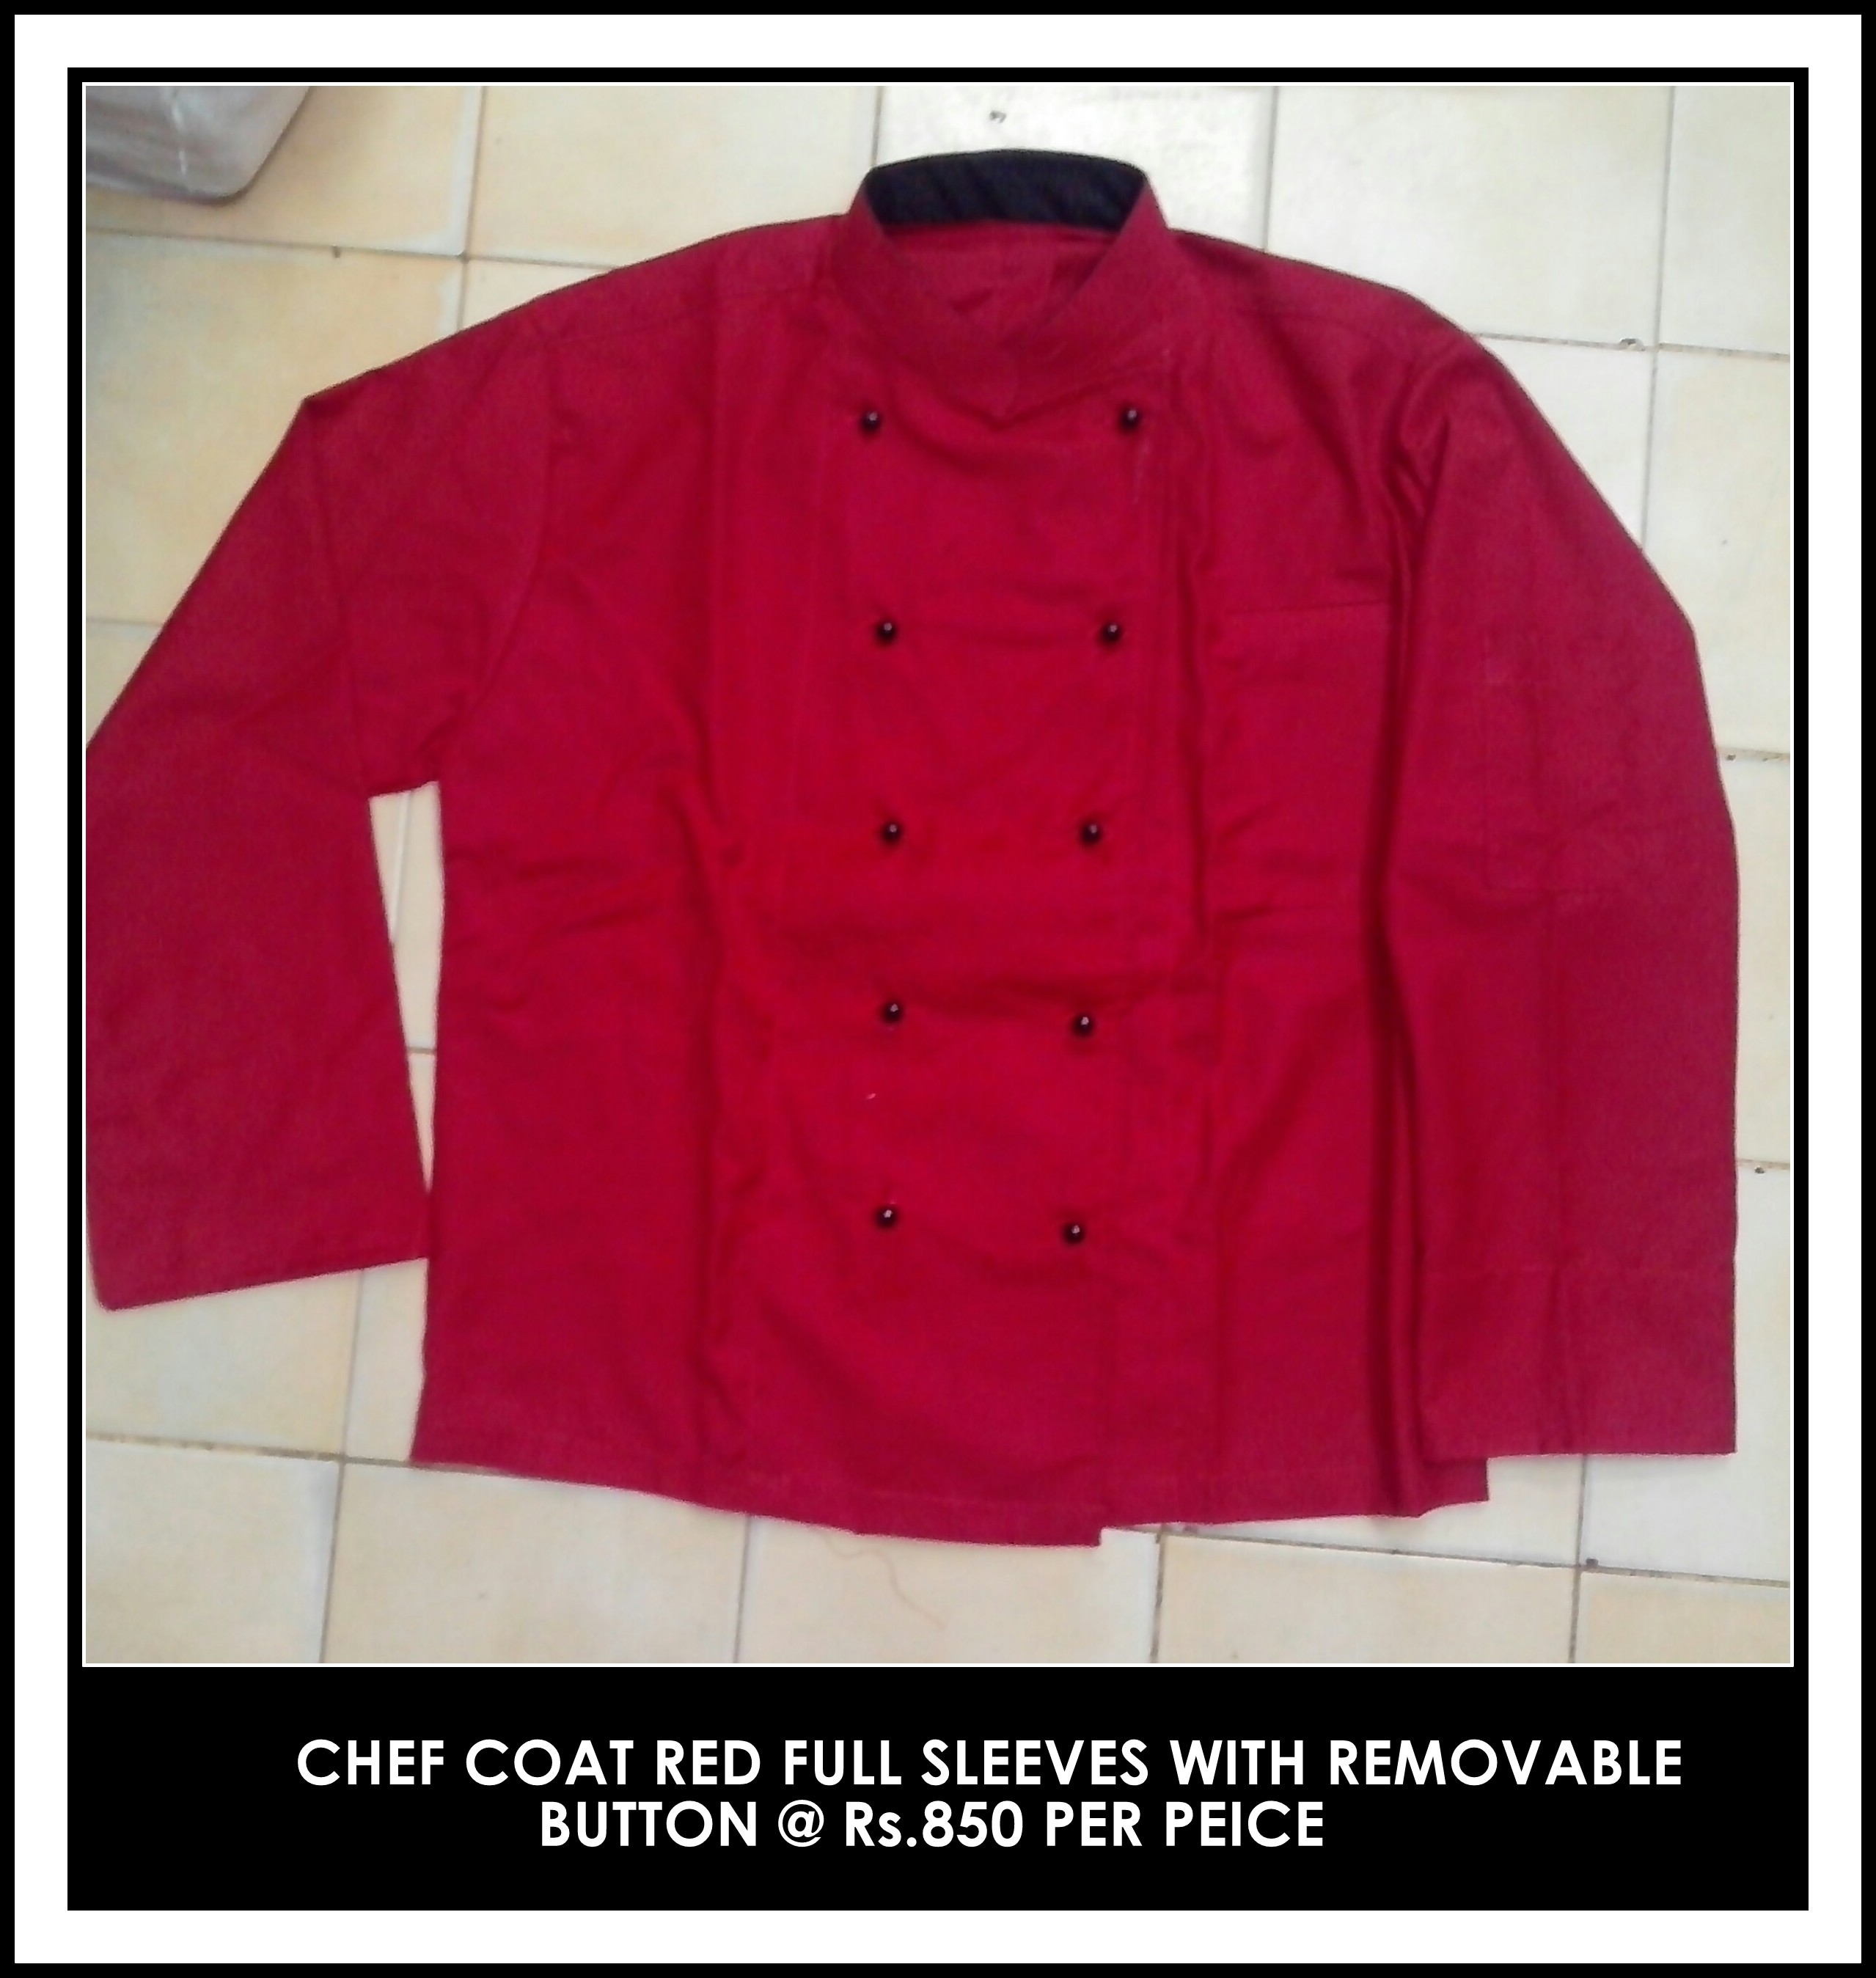 Customized Chef coat